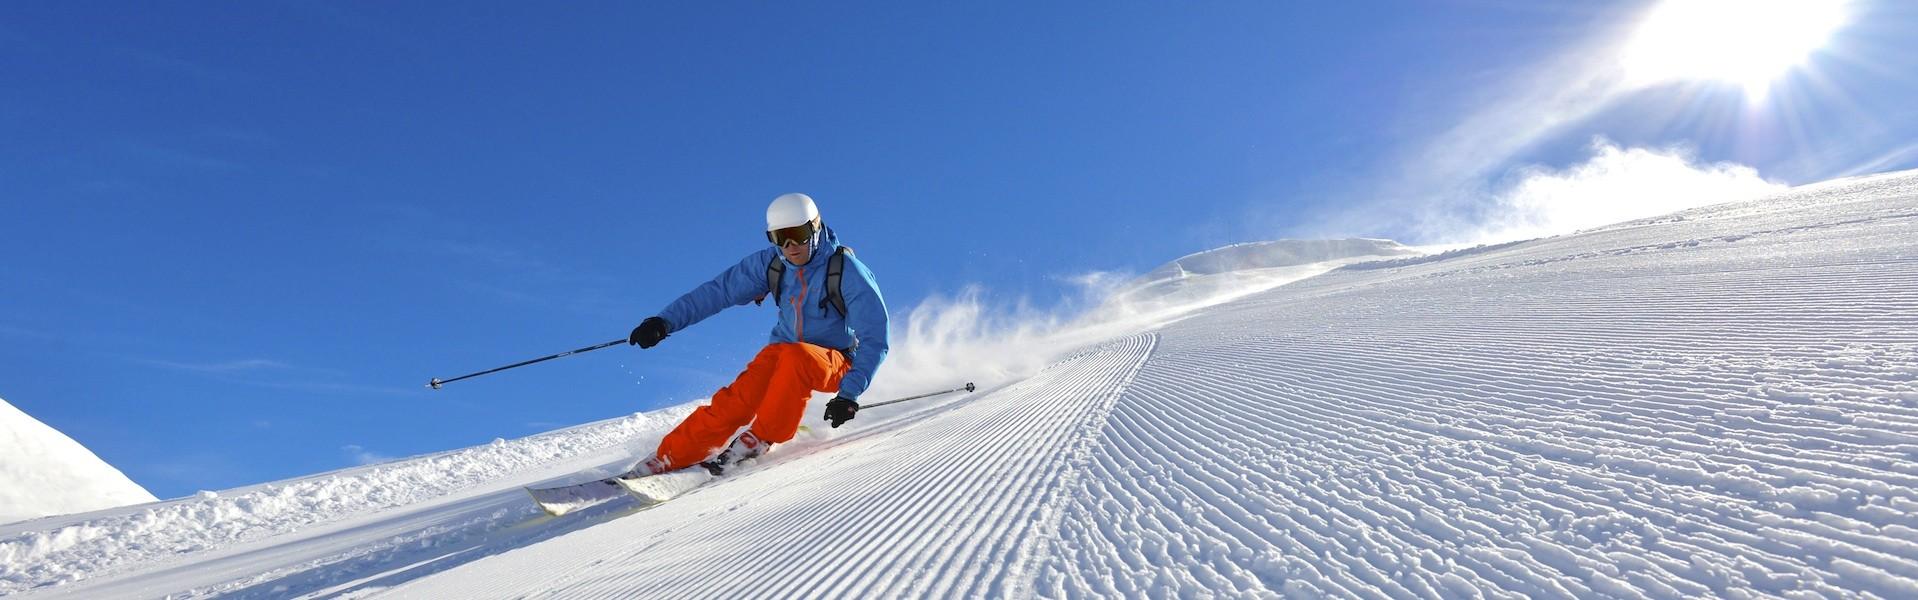 ski-david-machet-2893